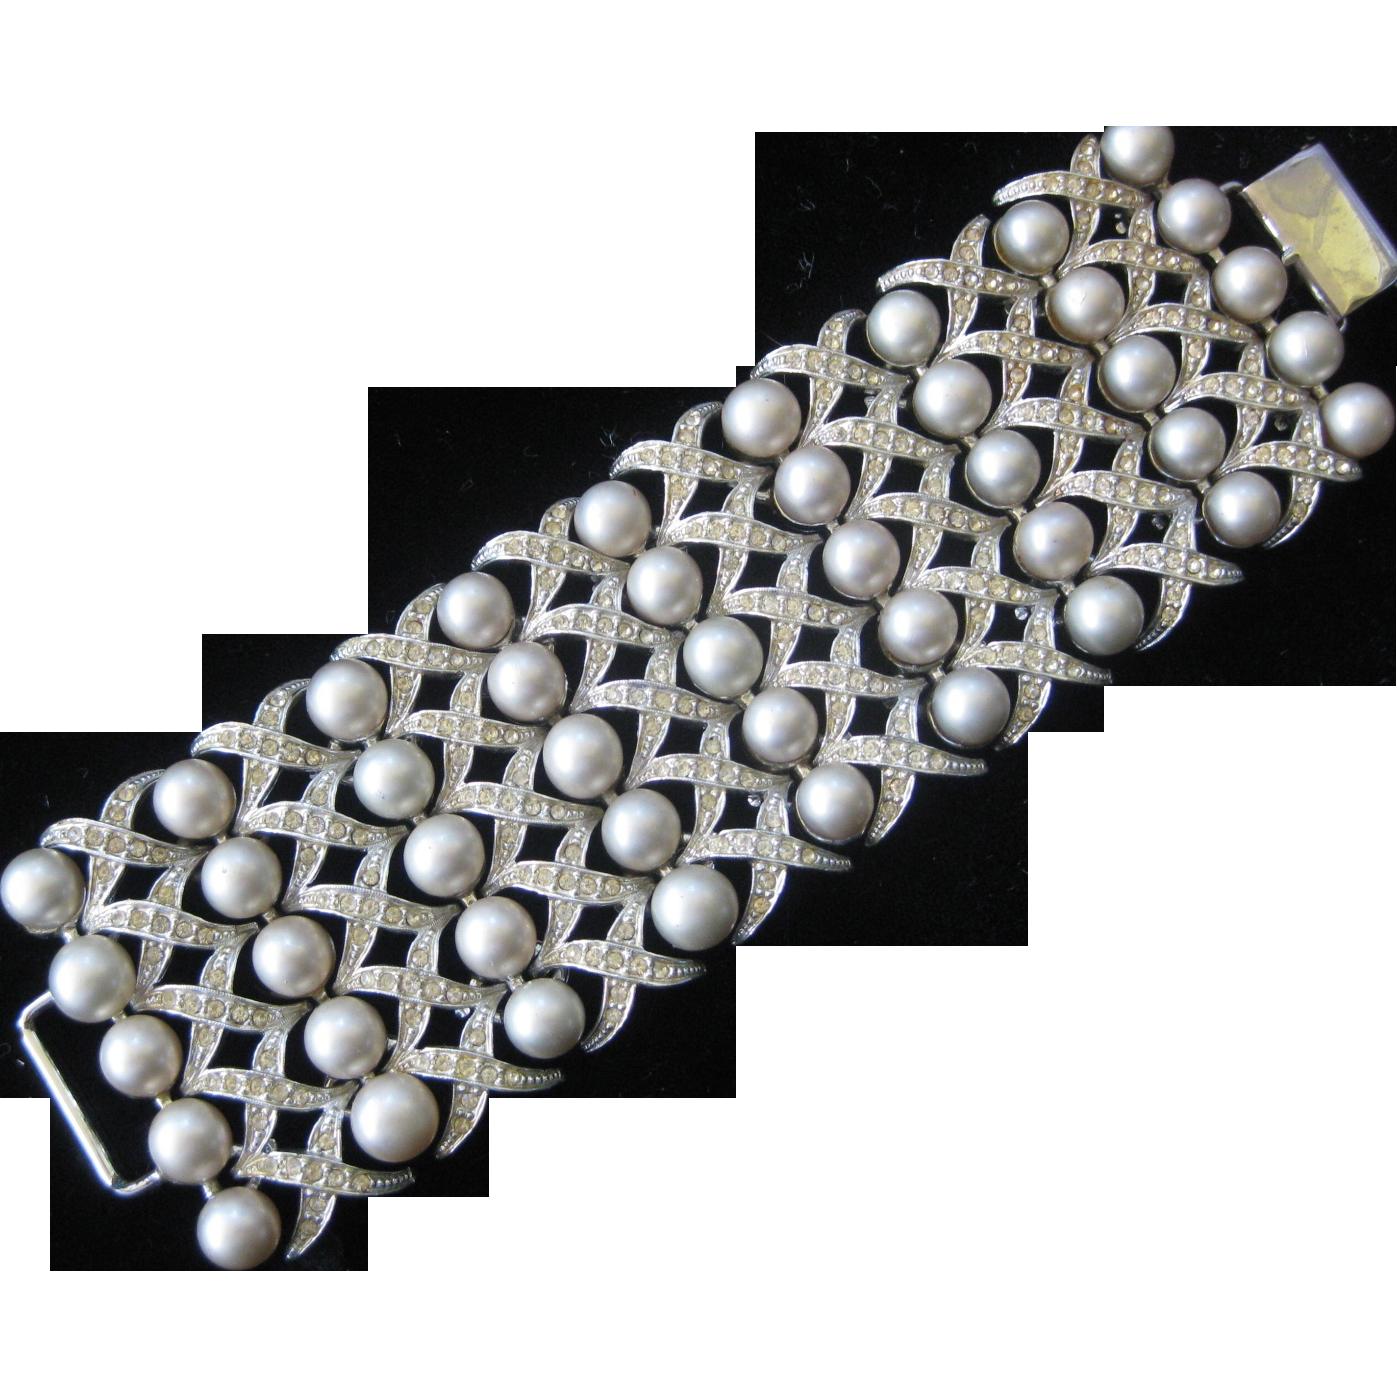 BERGERE Ultra Wide Heavy Vintage Pearls & Rhinestones Xs & Os Cuff Bracelet